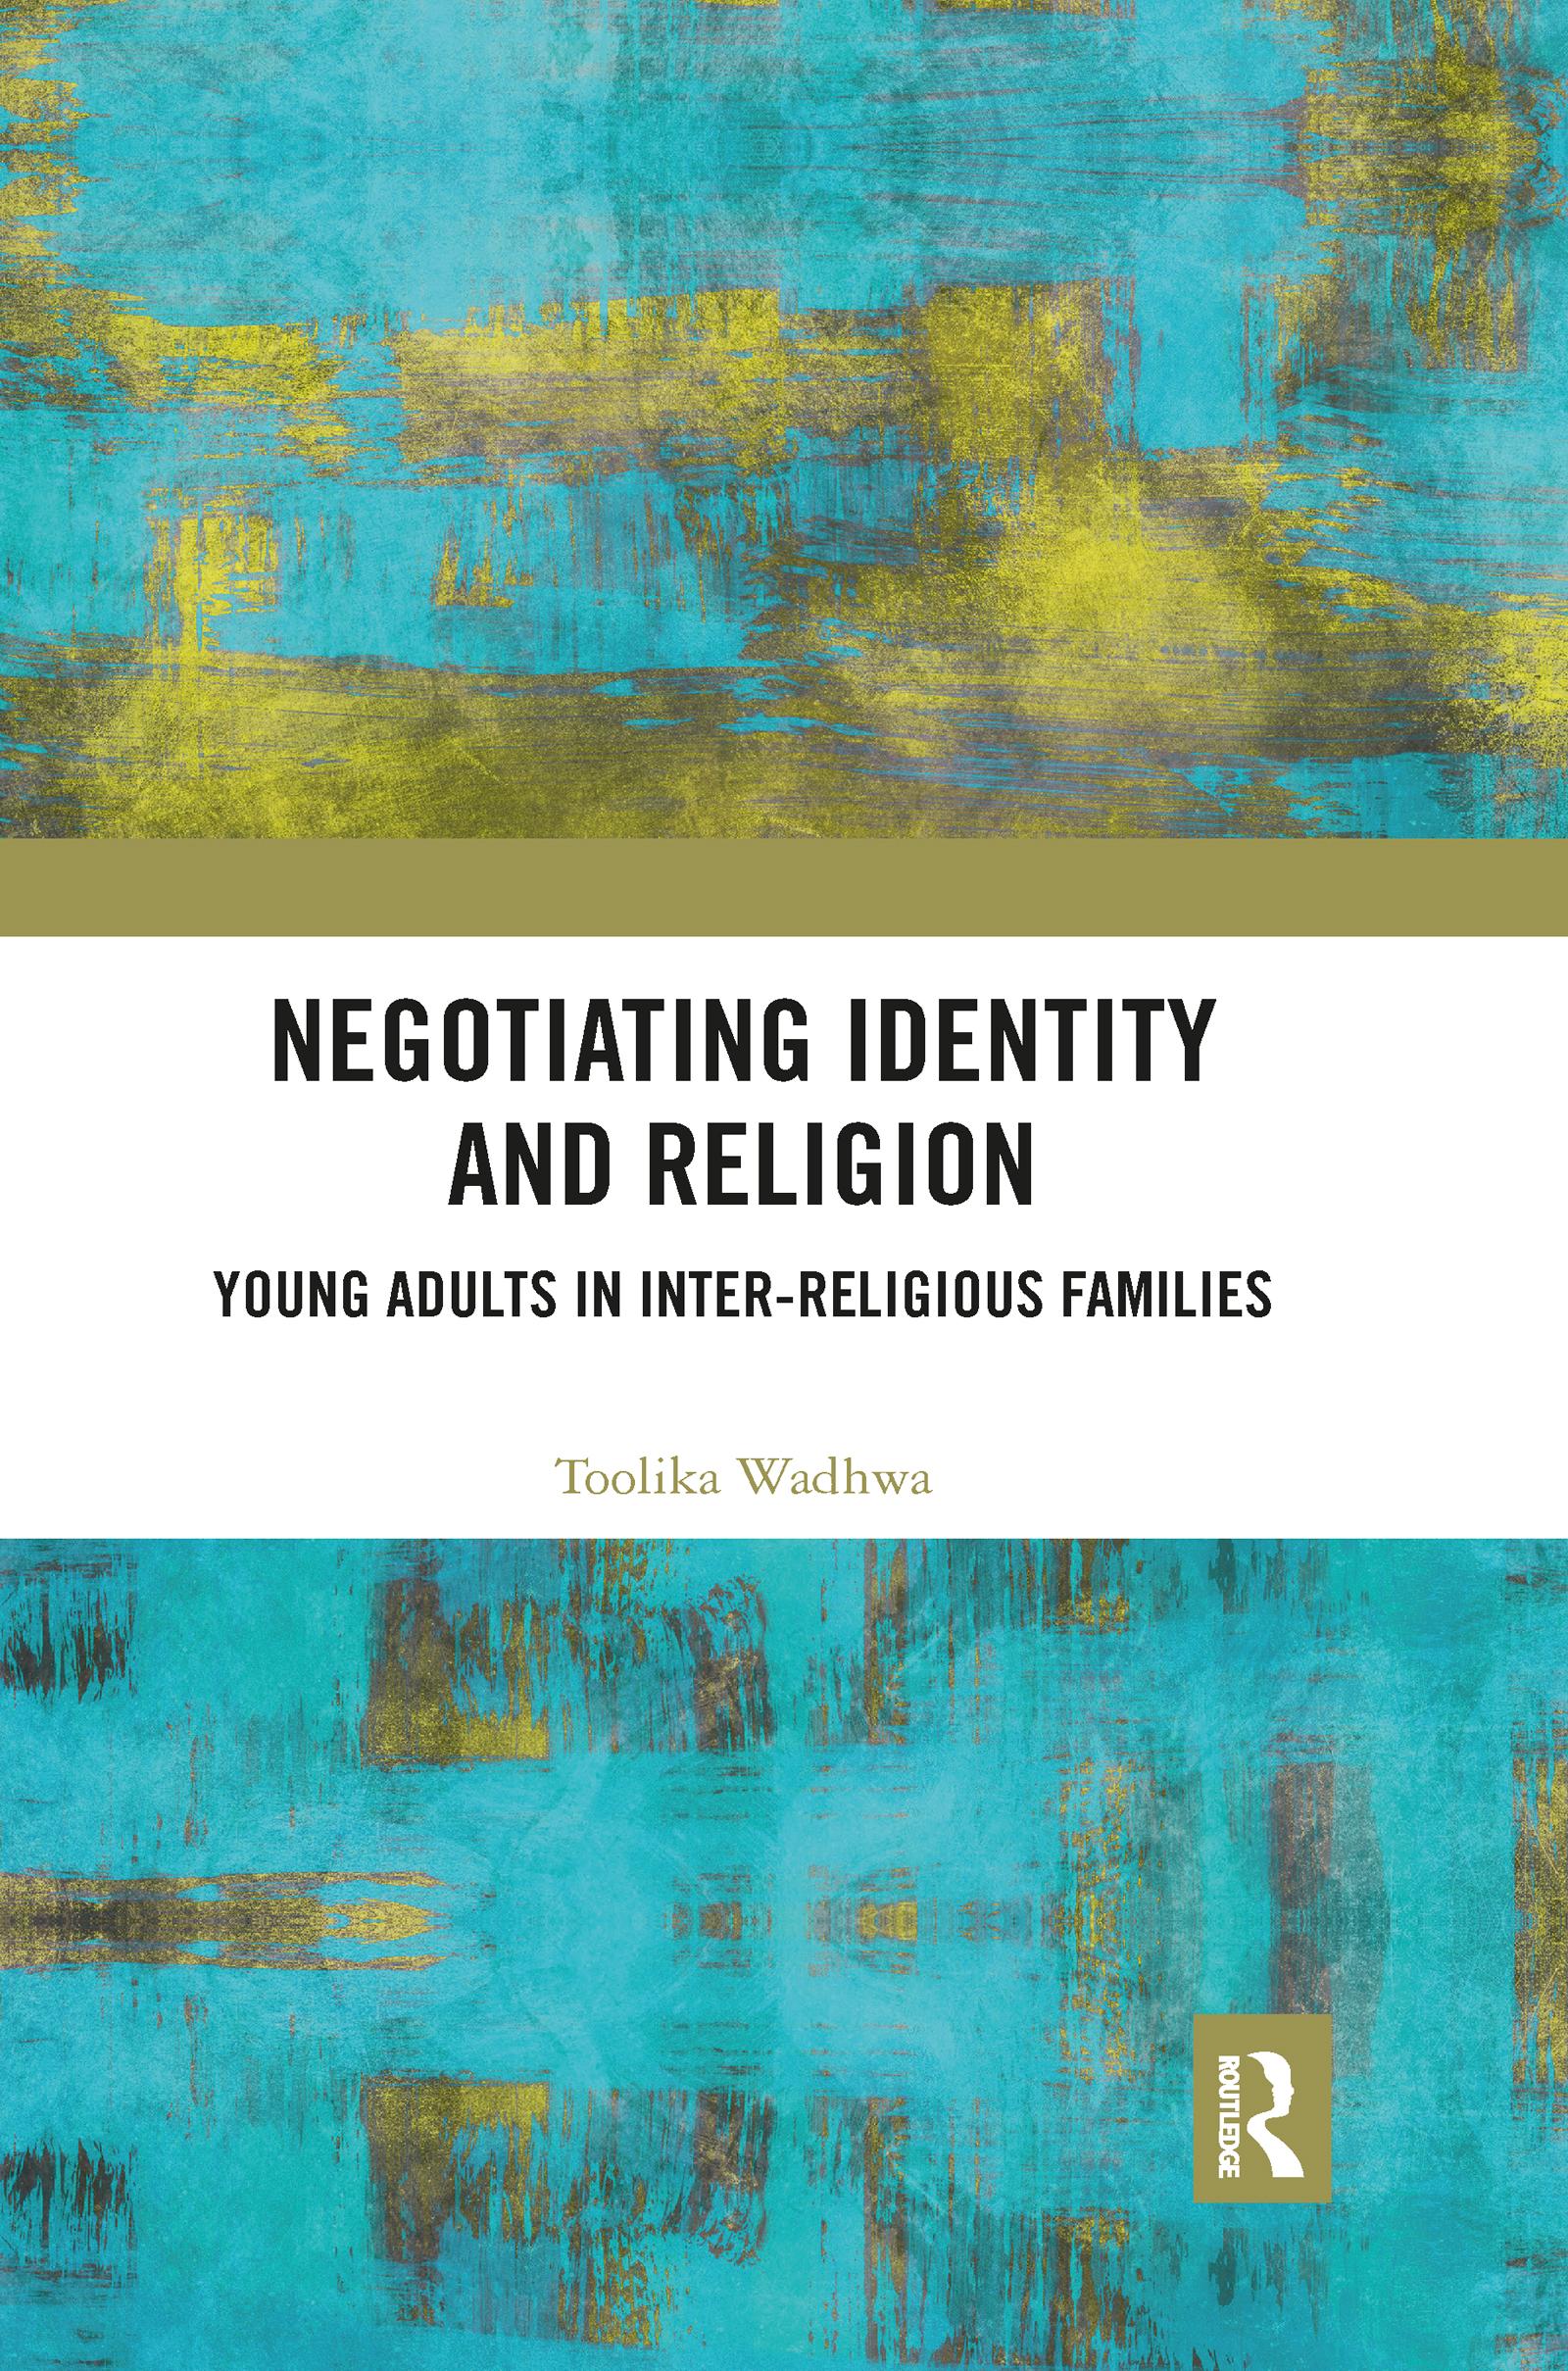 Negotiating Identity and Religion